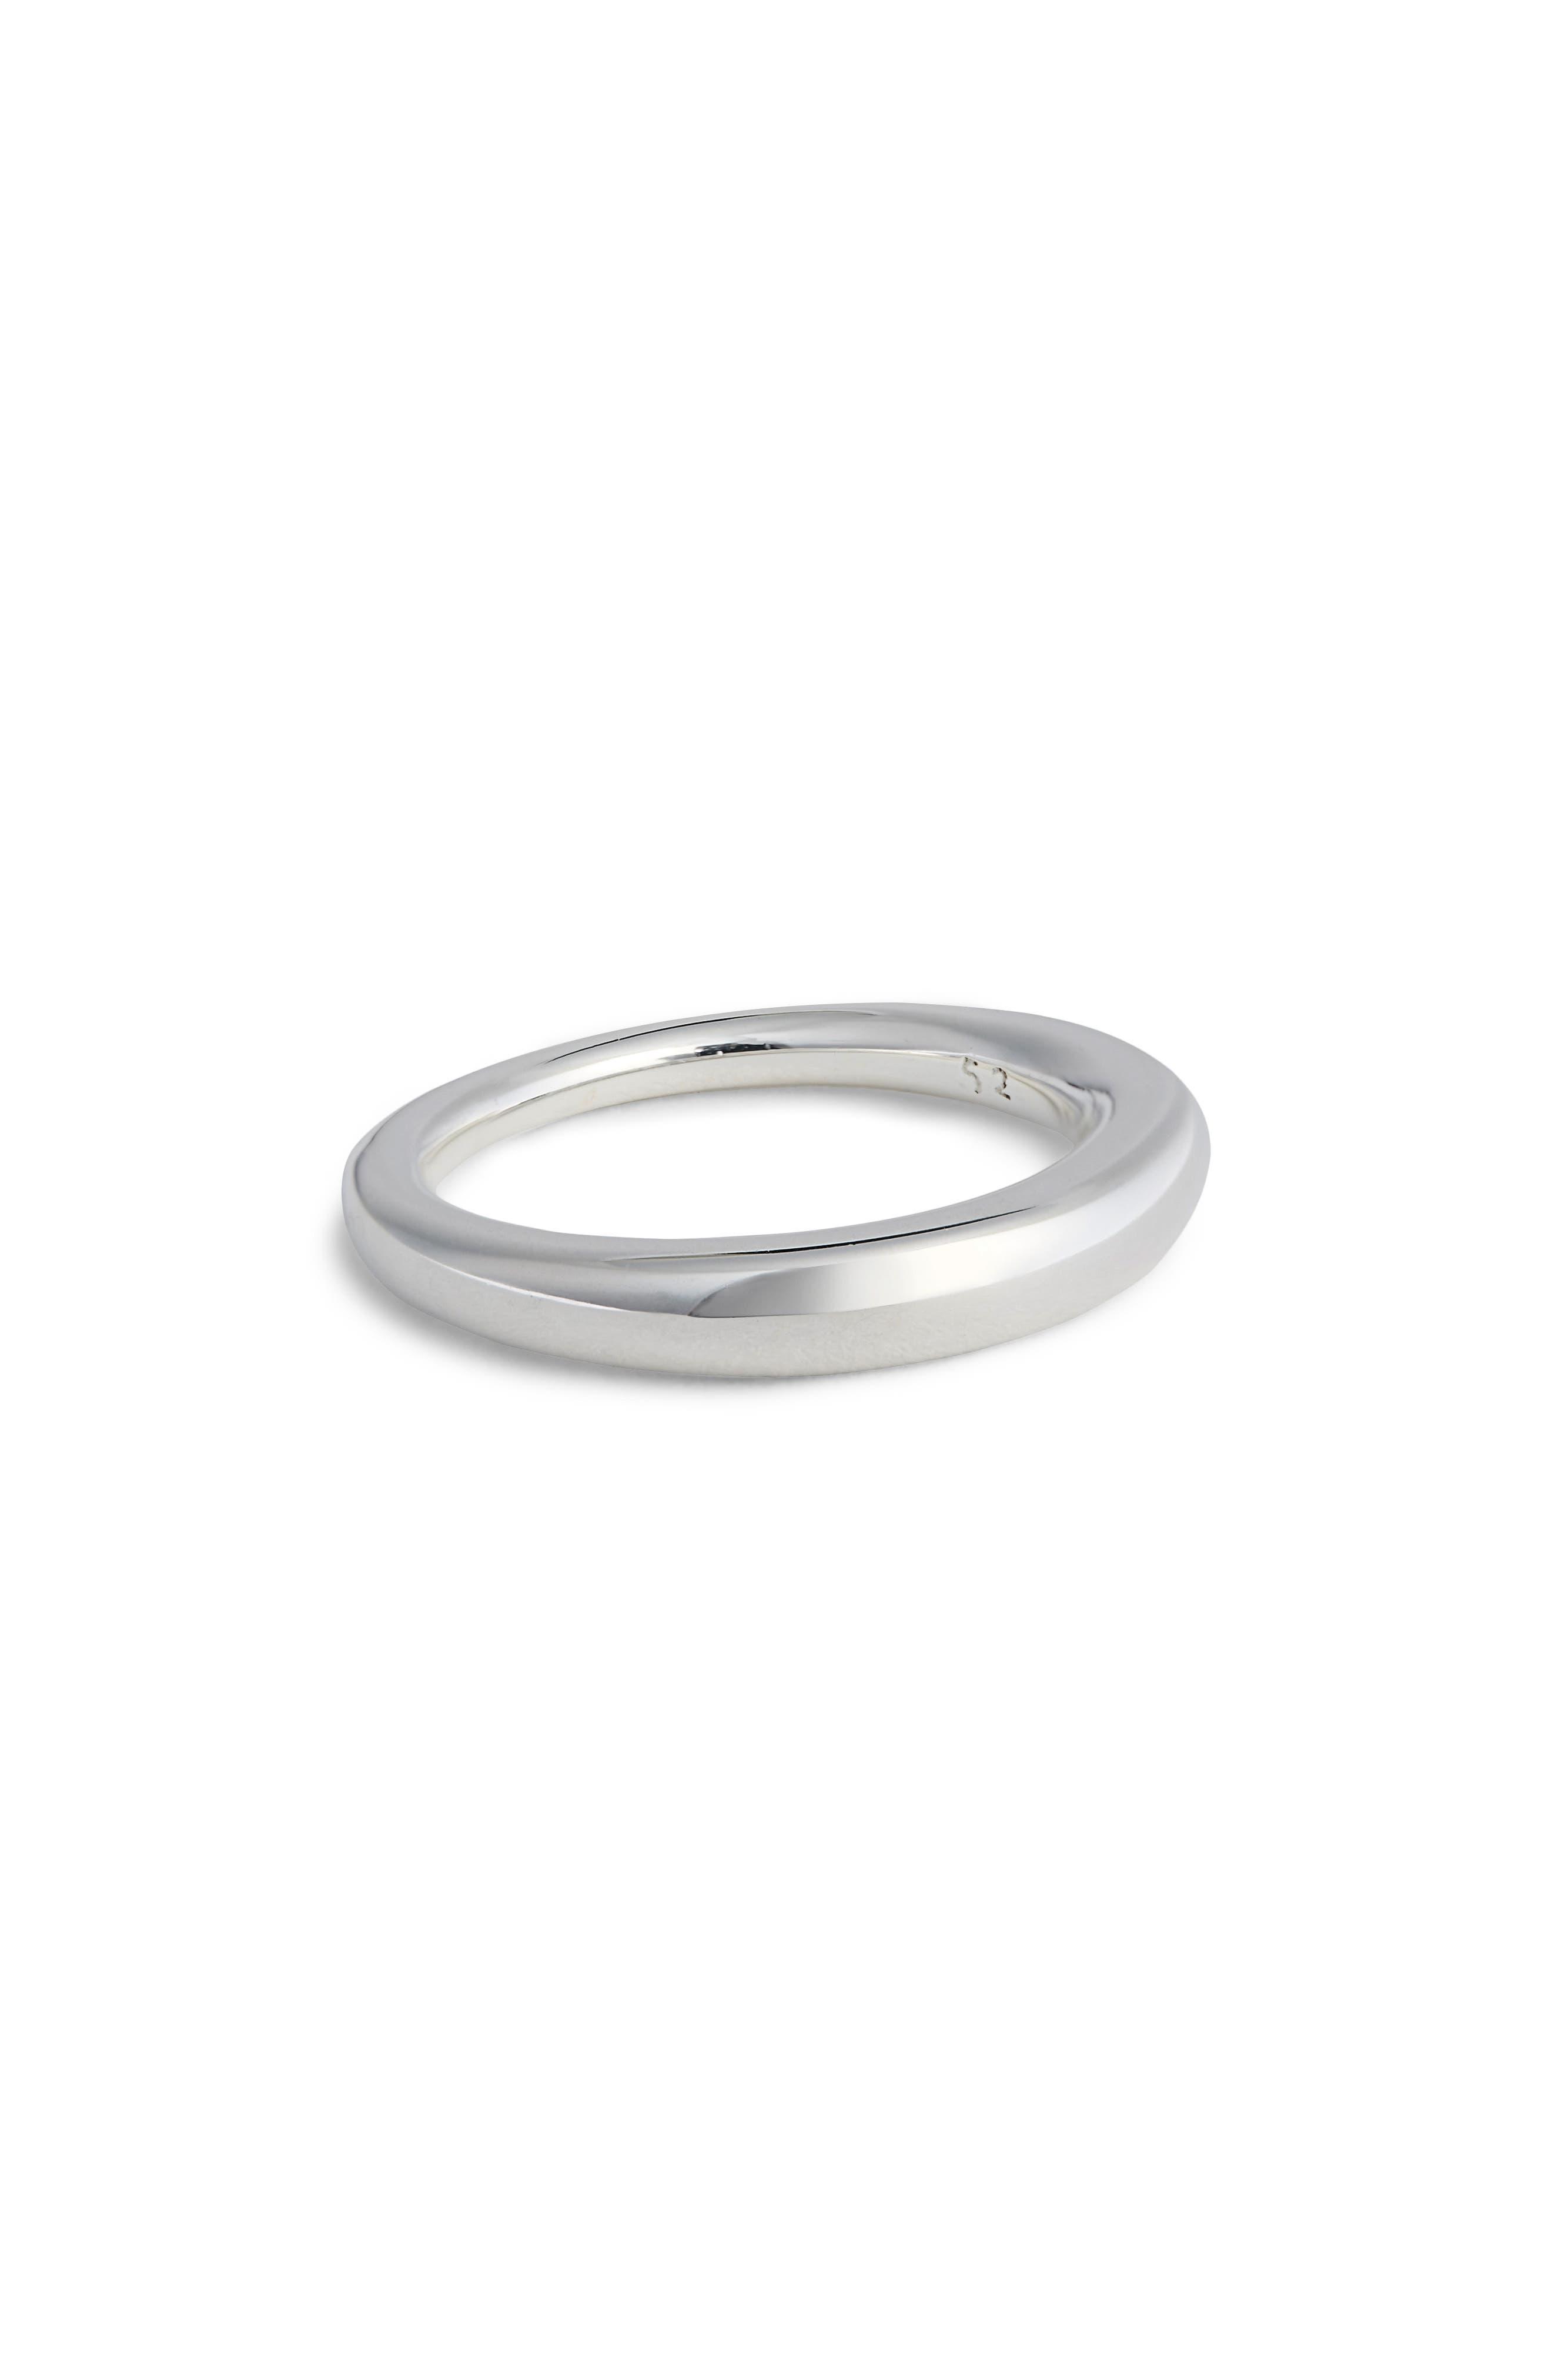 Small Snake Polished Silver Ring,                             Main thumbnail 1, color,                             POLISHED SILVER